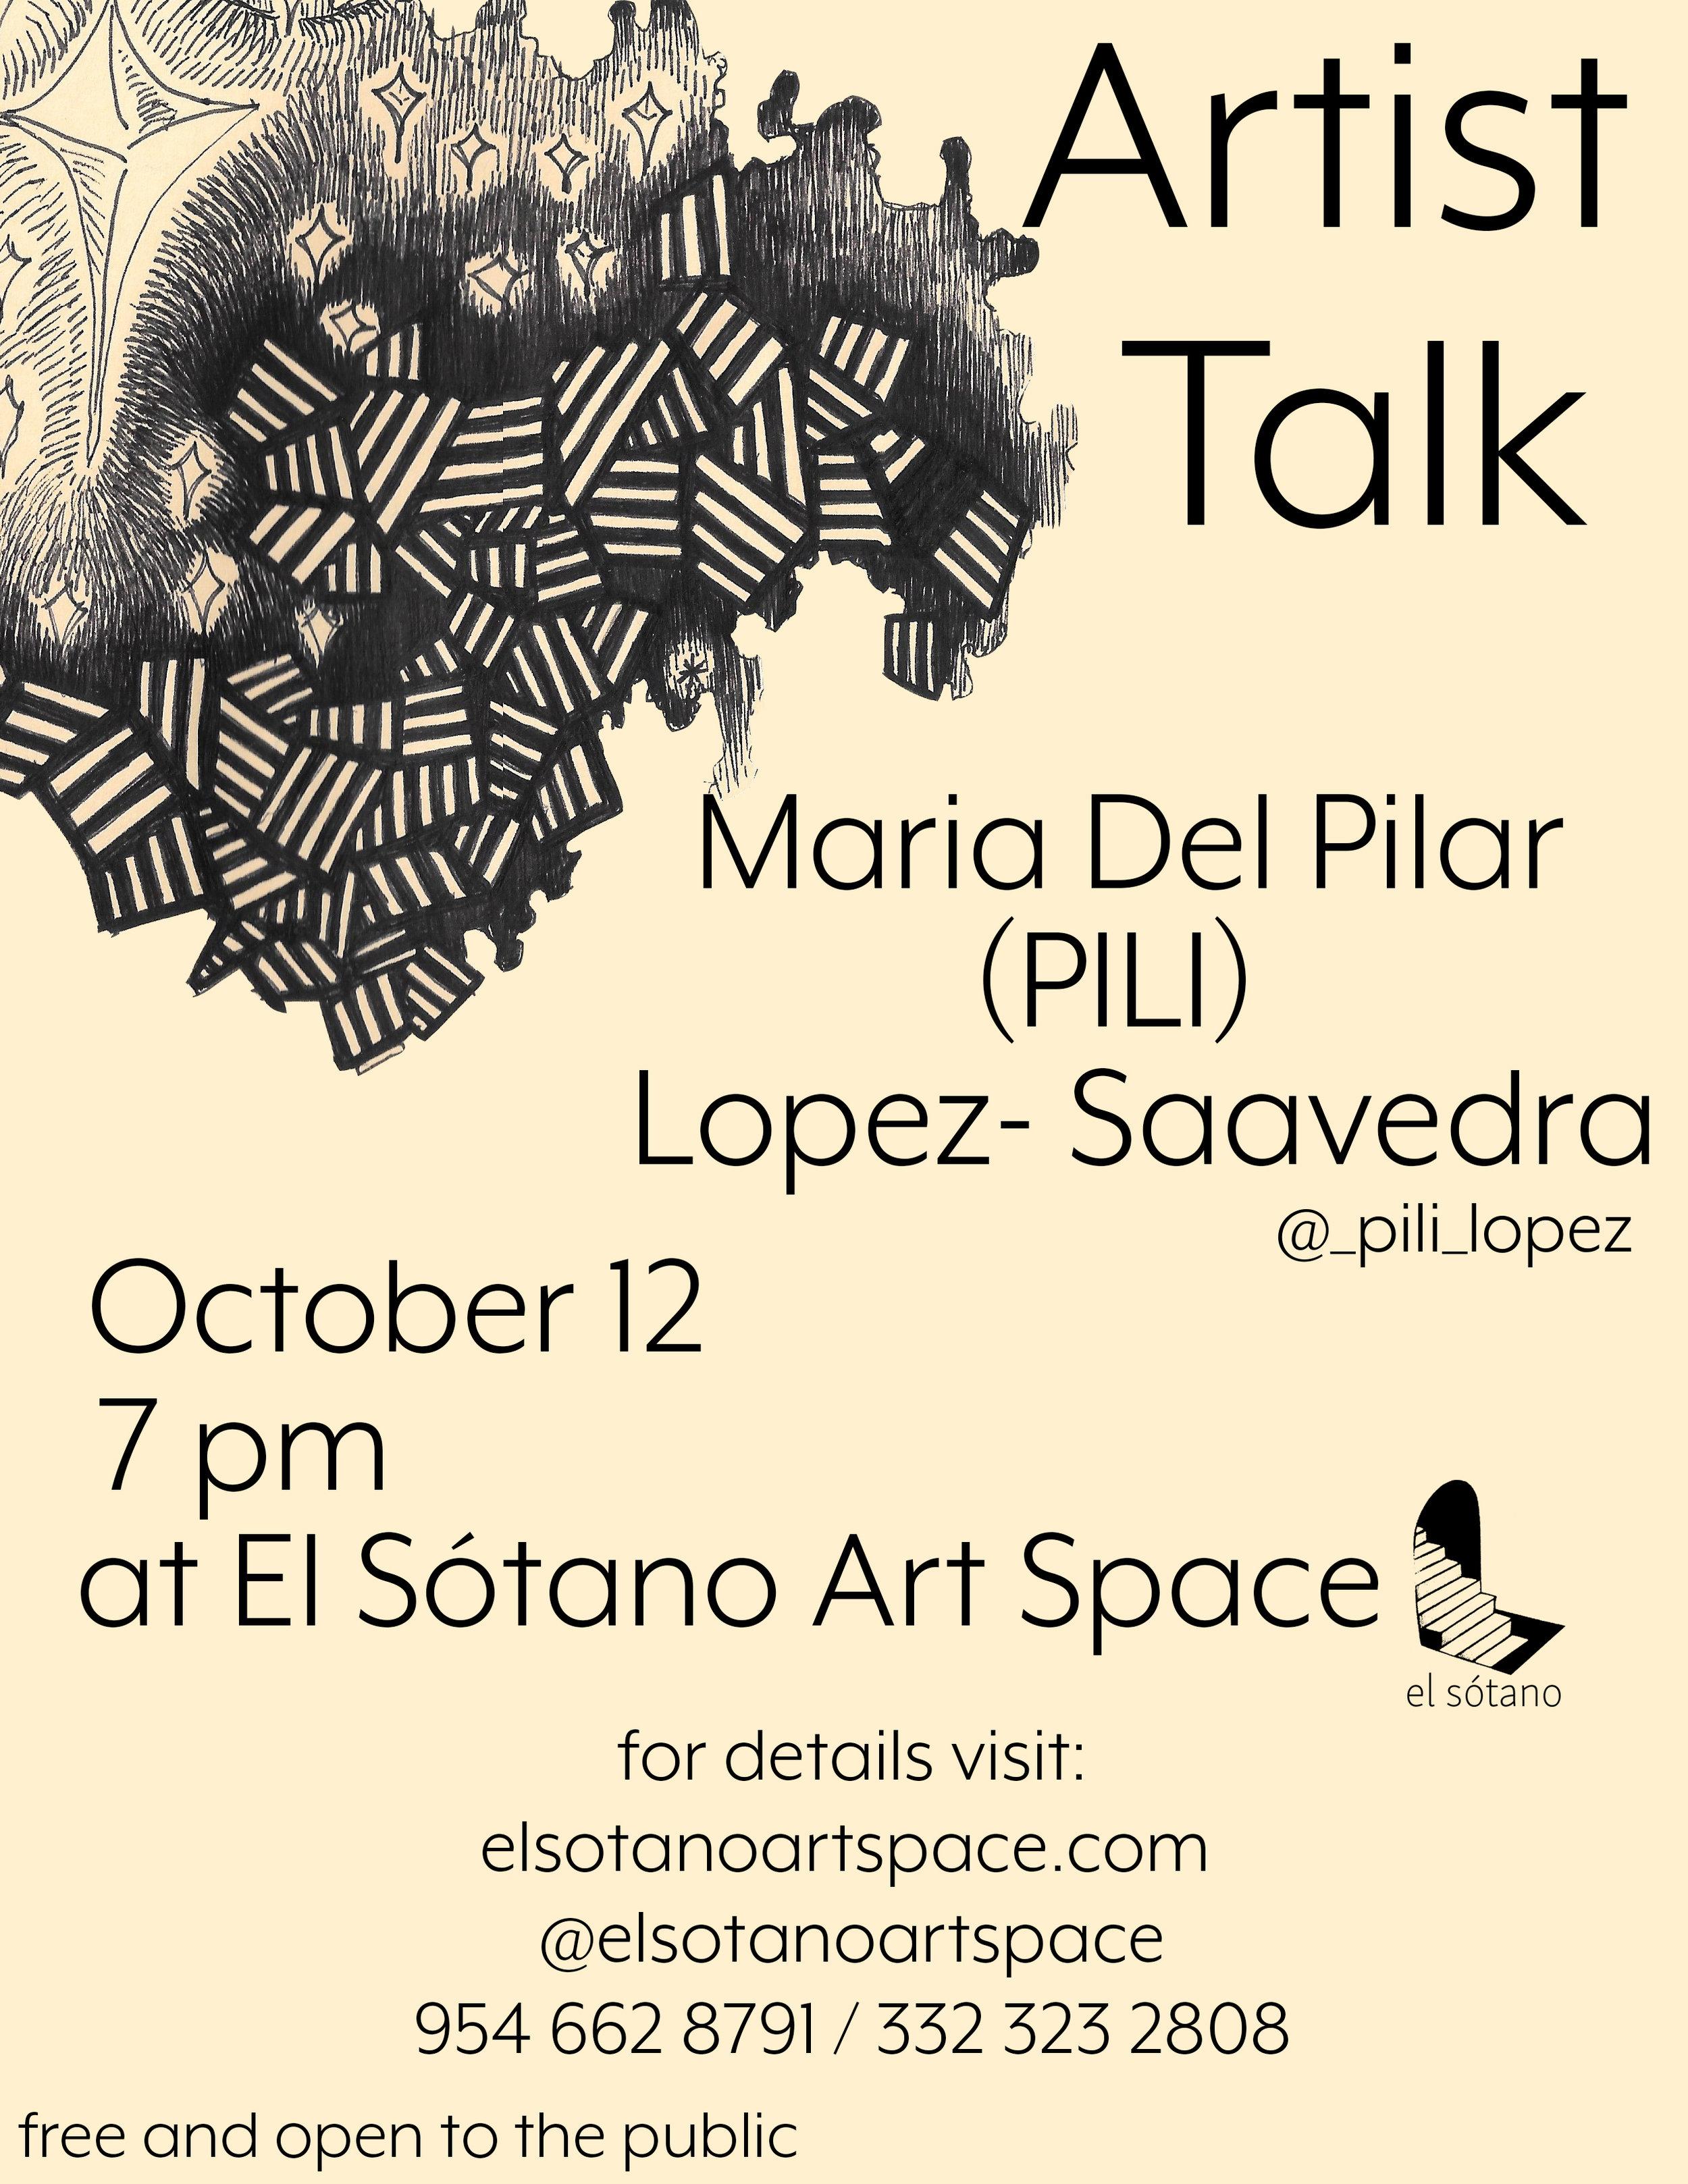 pili artist talk flyer.jpg